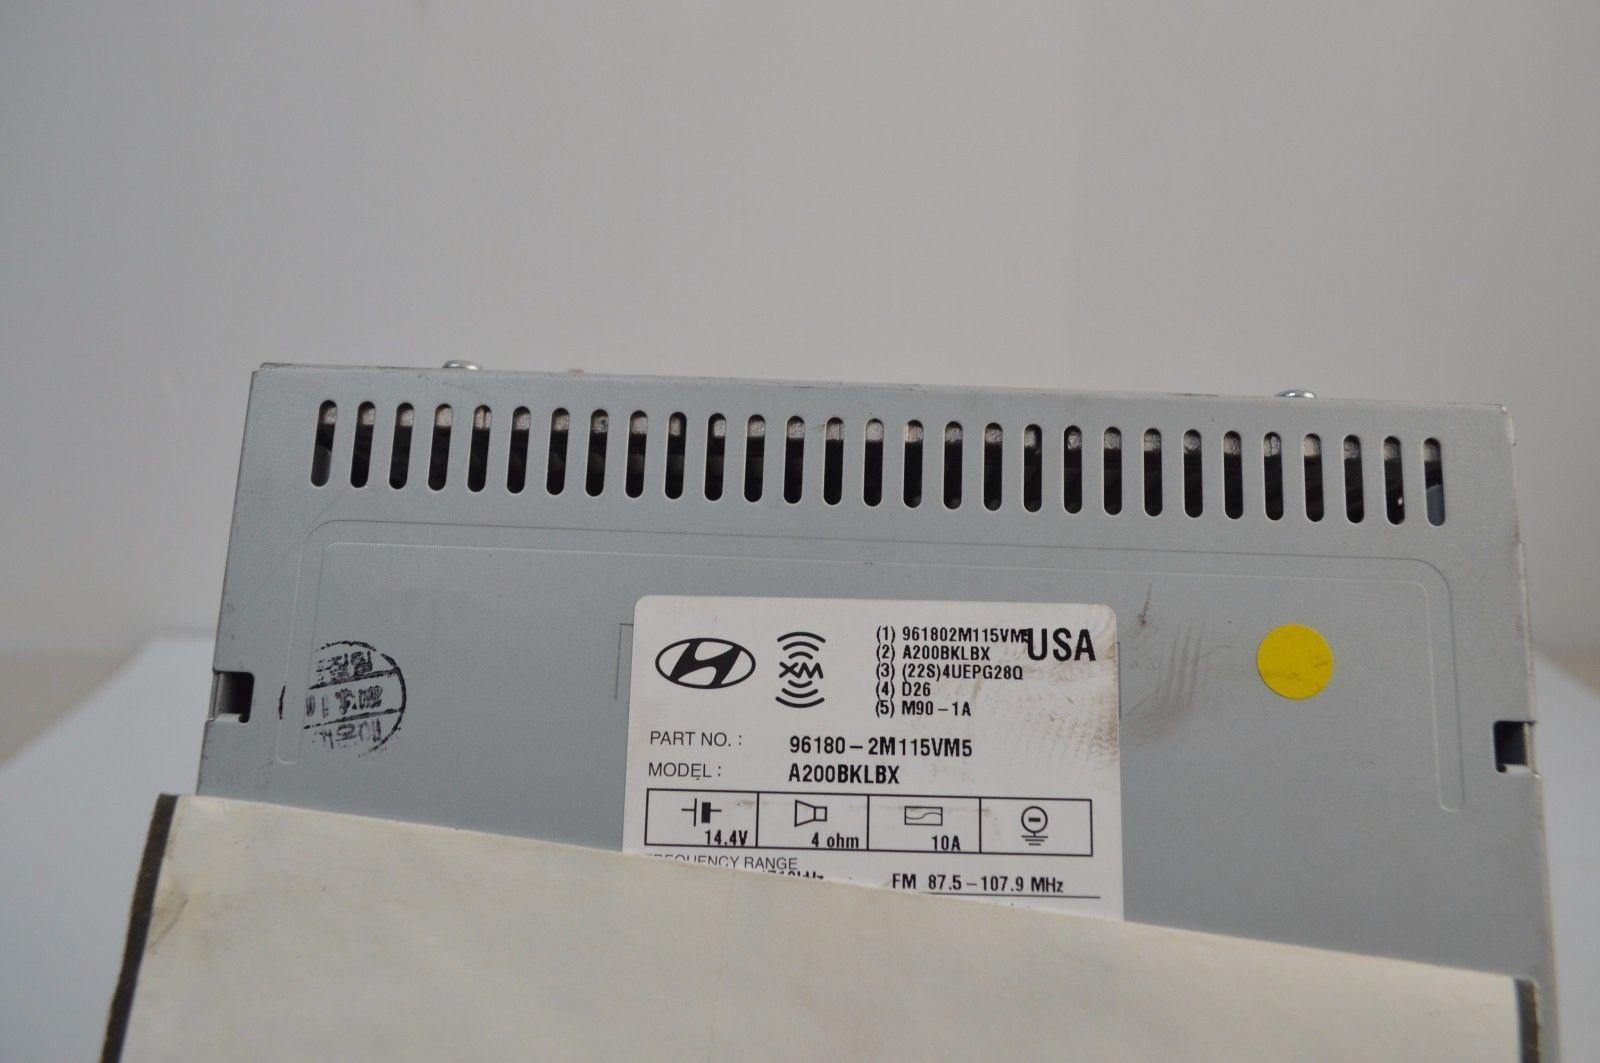 2011 2012 Hyundai Genesis Radio Cd MP3 Player 96180-2M115VM5 TESTED A34#0028